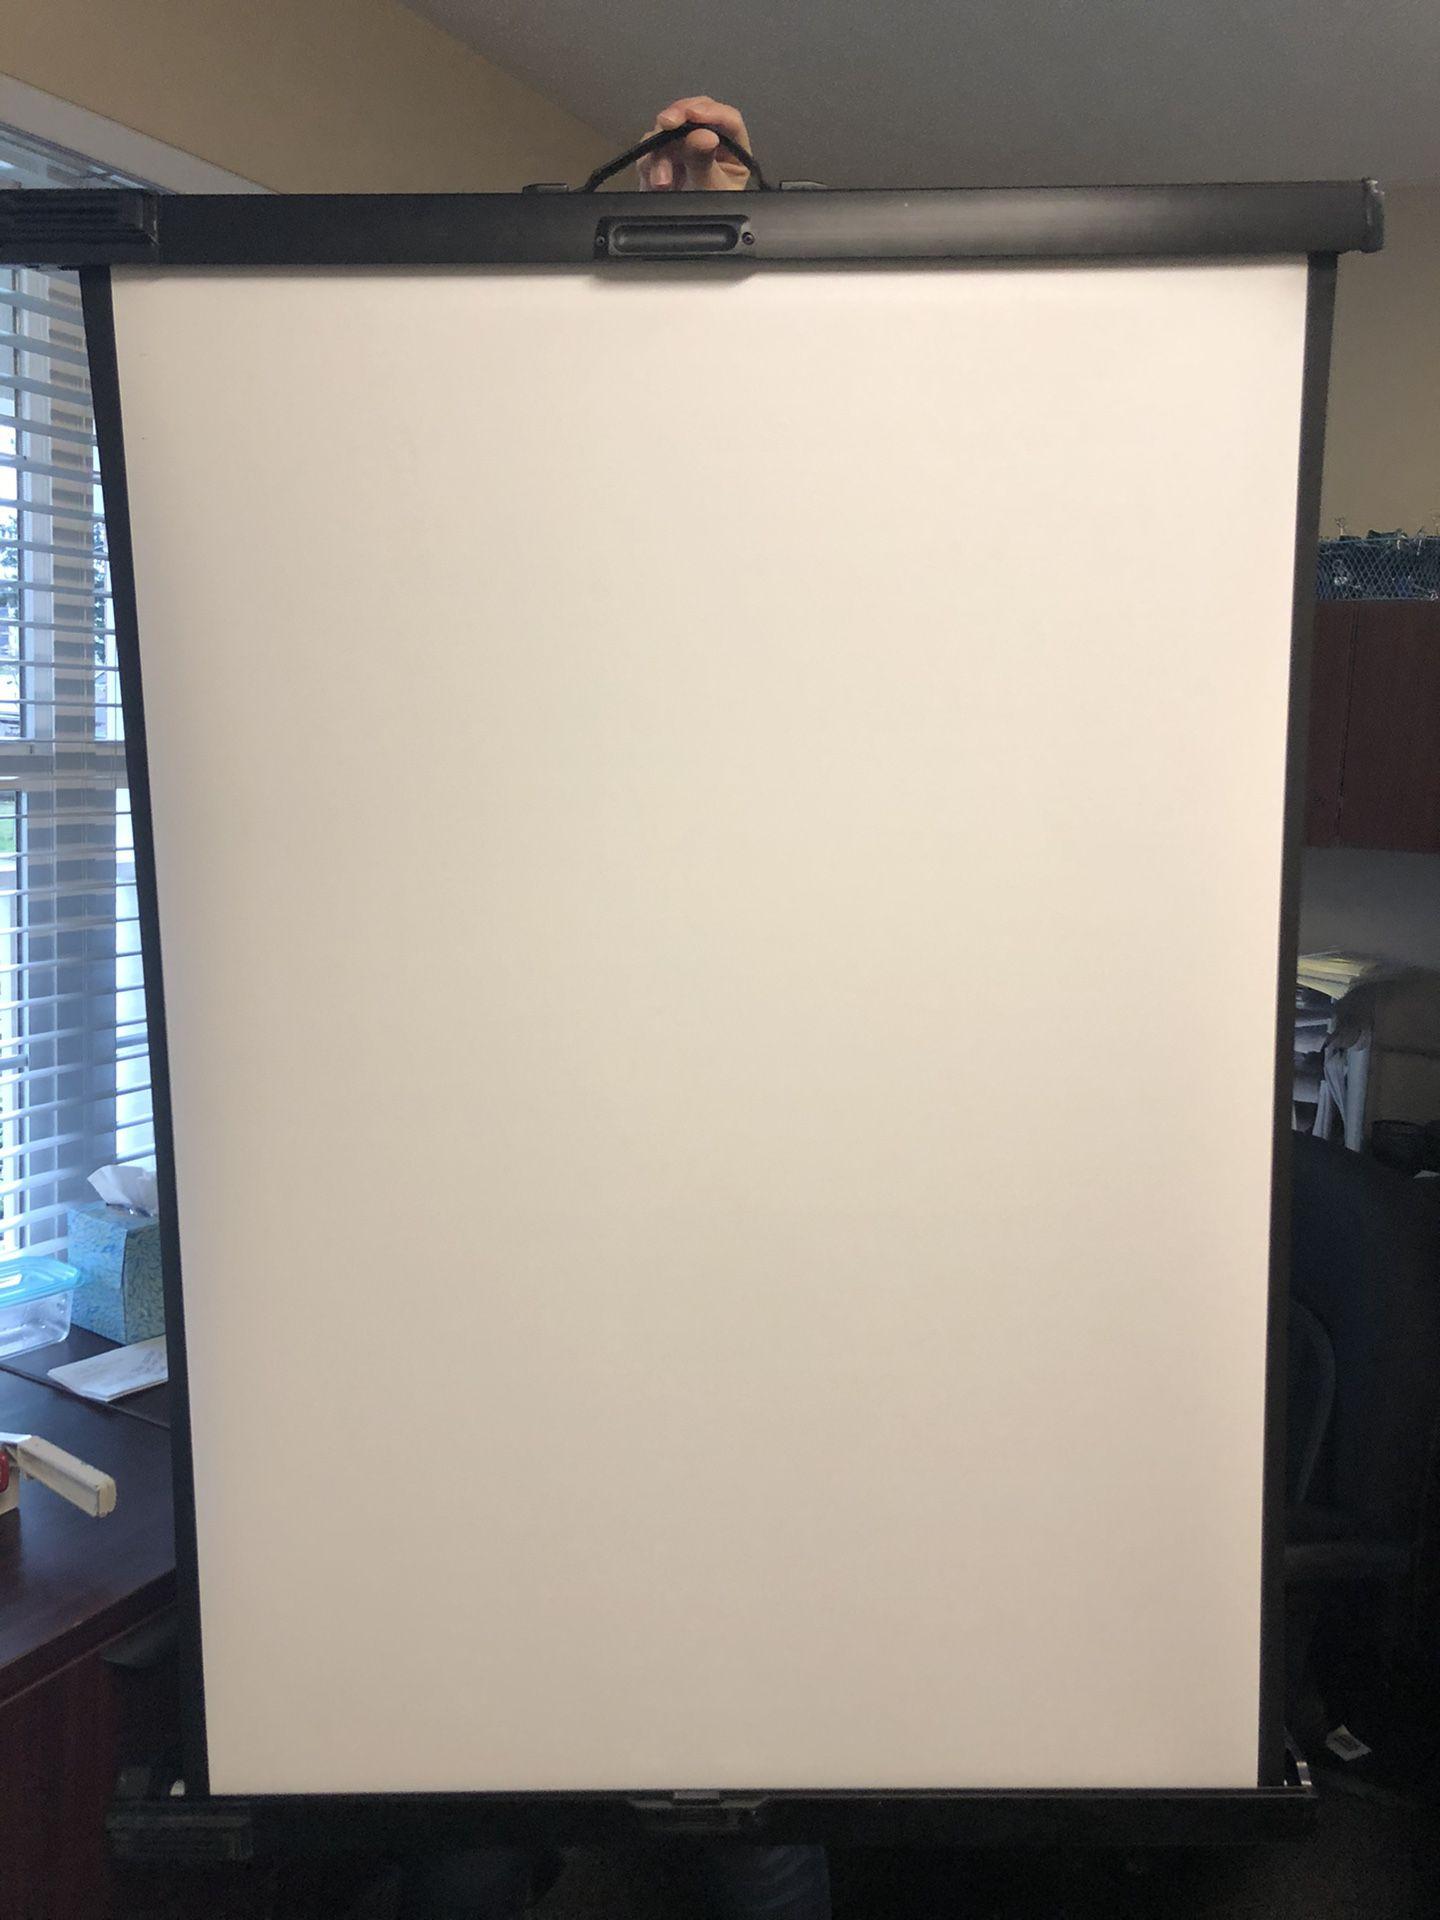 InFocus Retractable White Screen